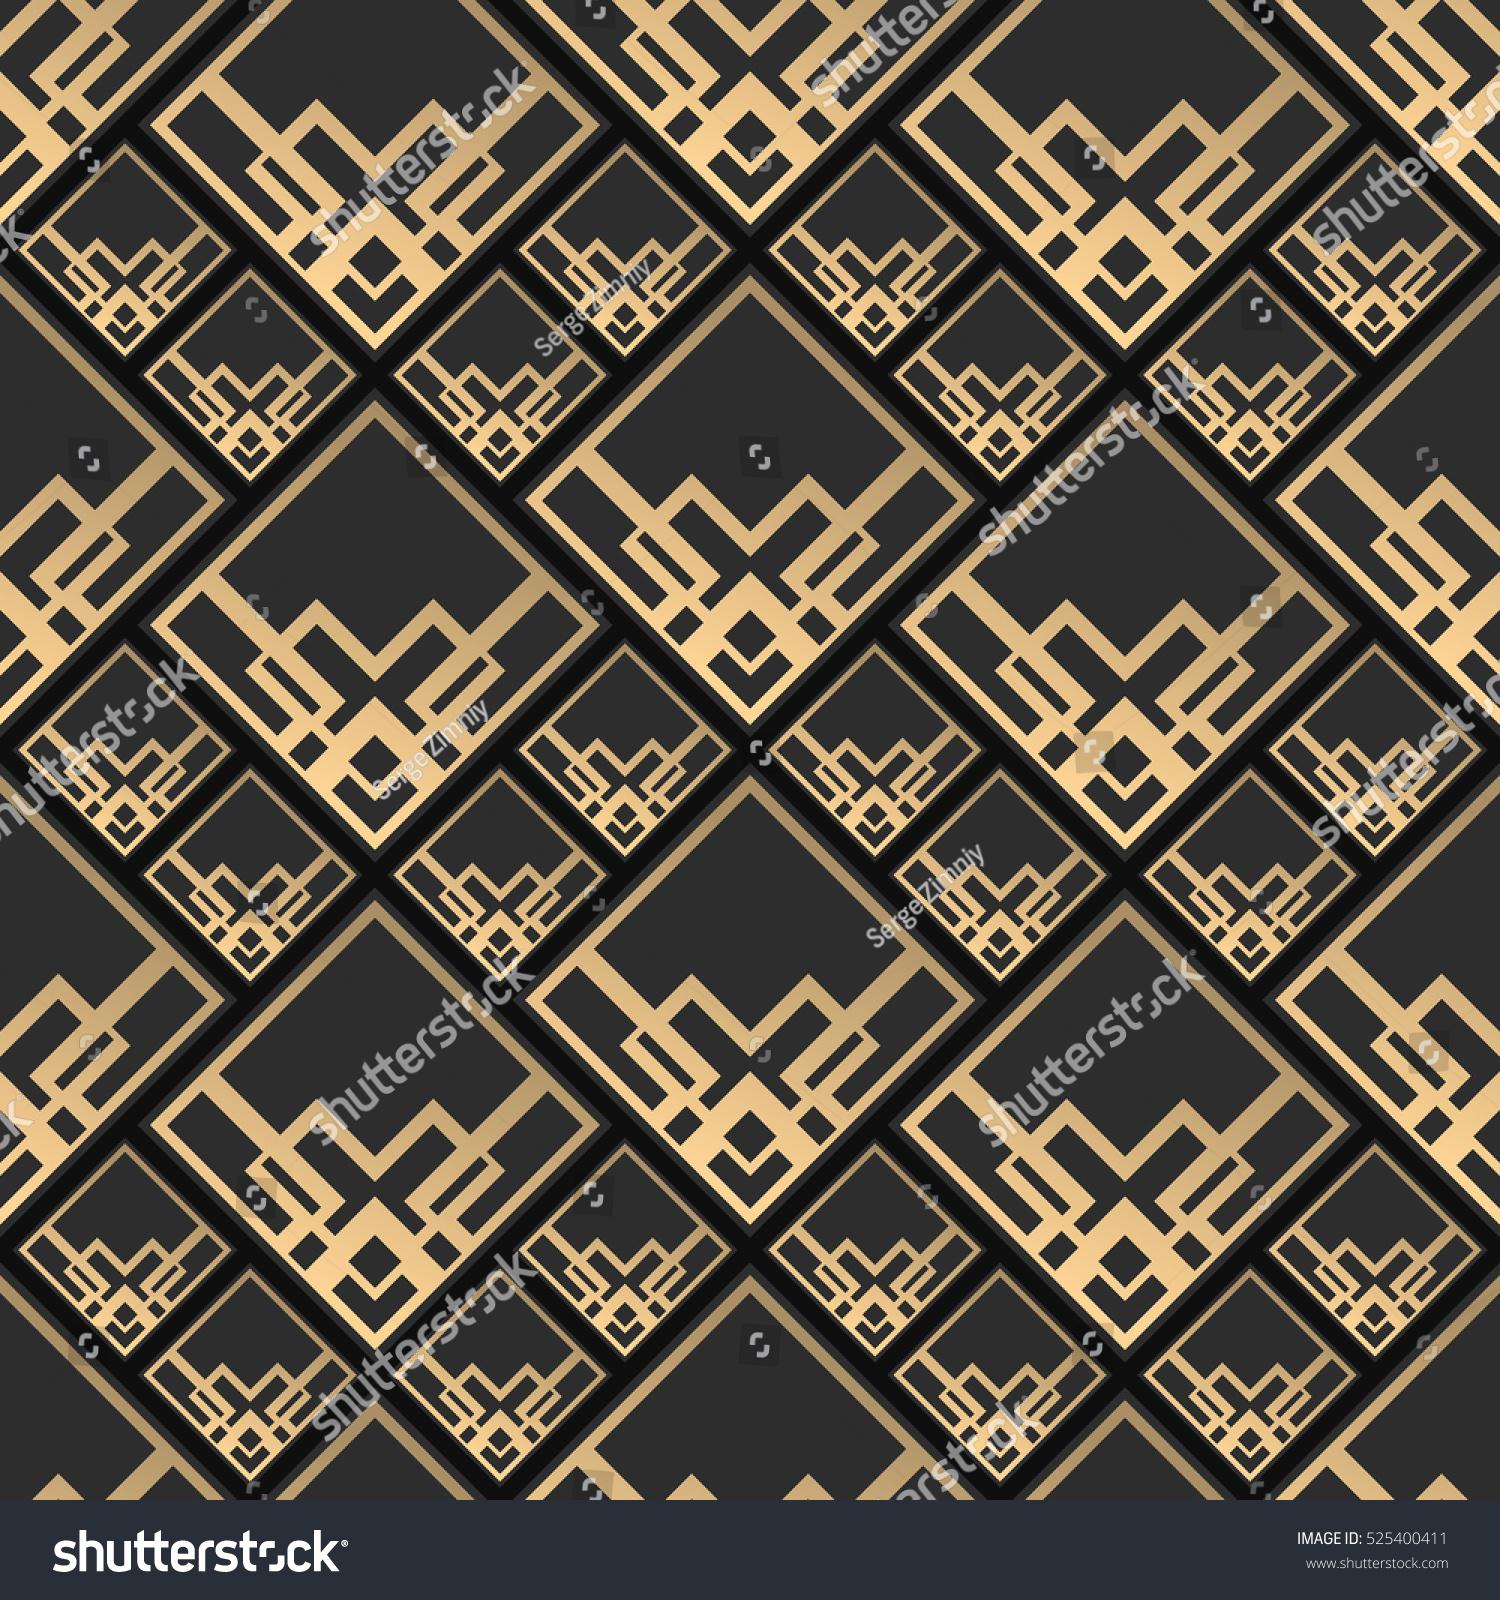 Seamless pattern art deco style black stock vector 525400411 seamless pattern in art deco style black and golden tilework 3d effect ceramic tiles dailygadgetfo Images